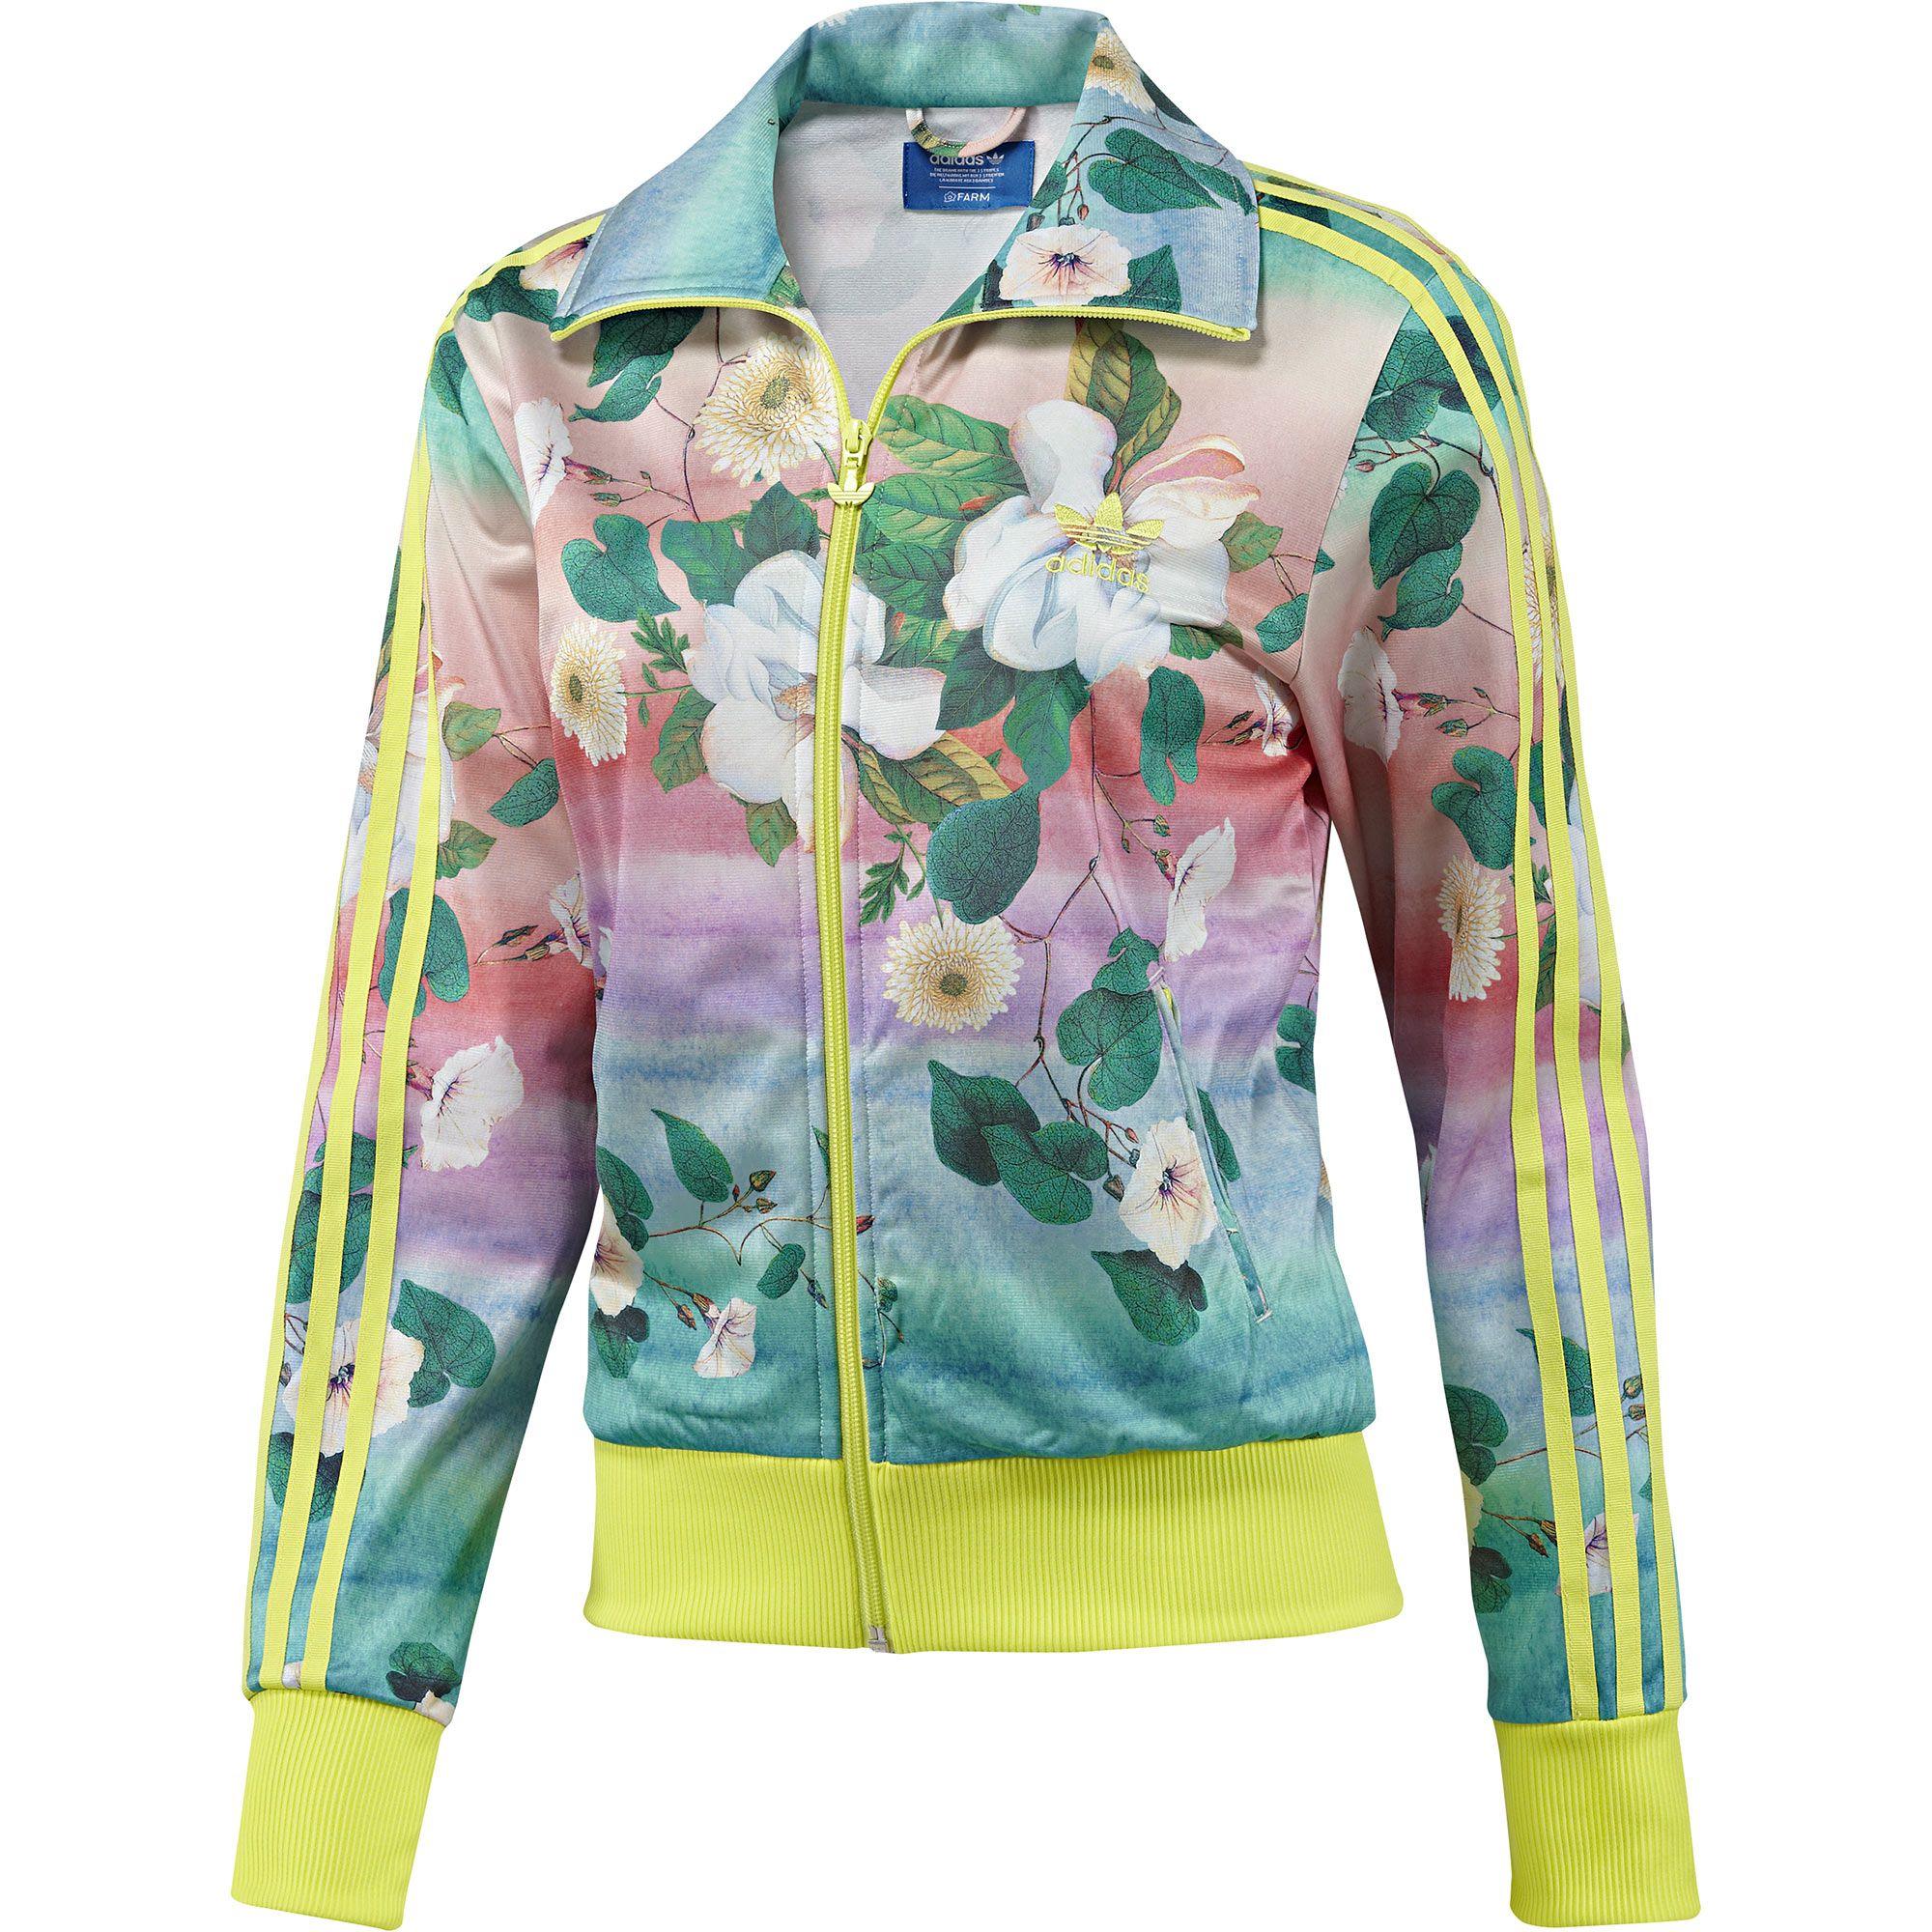 Adidas firebird jacket womens uk